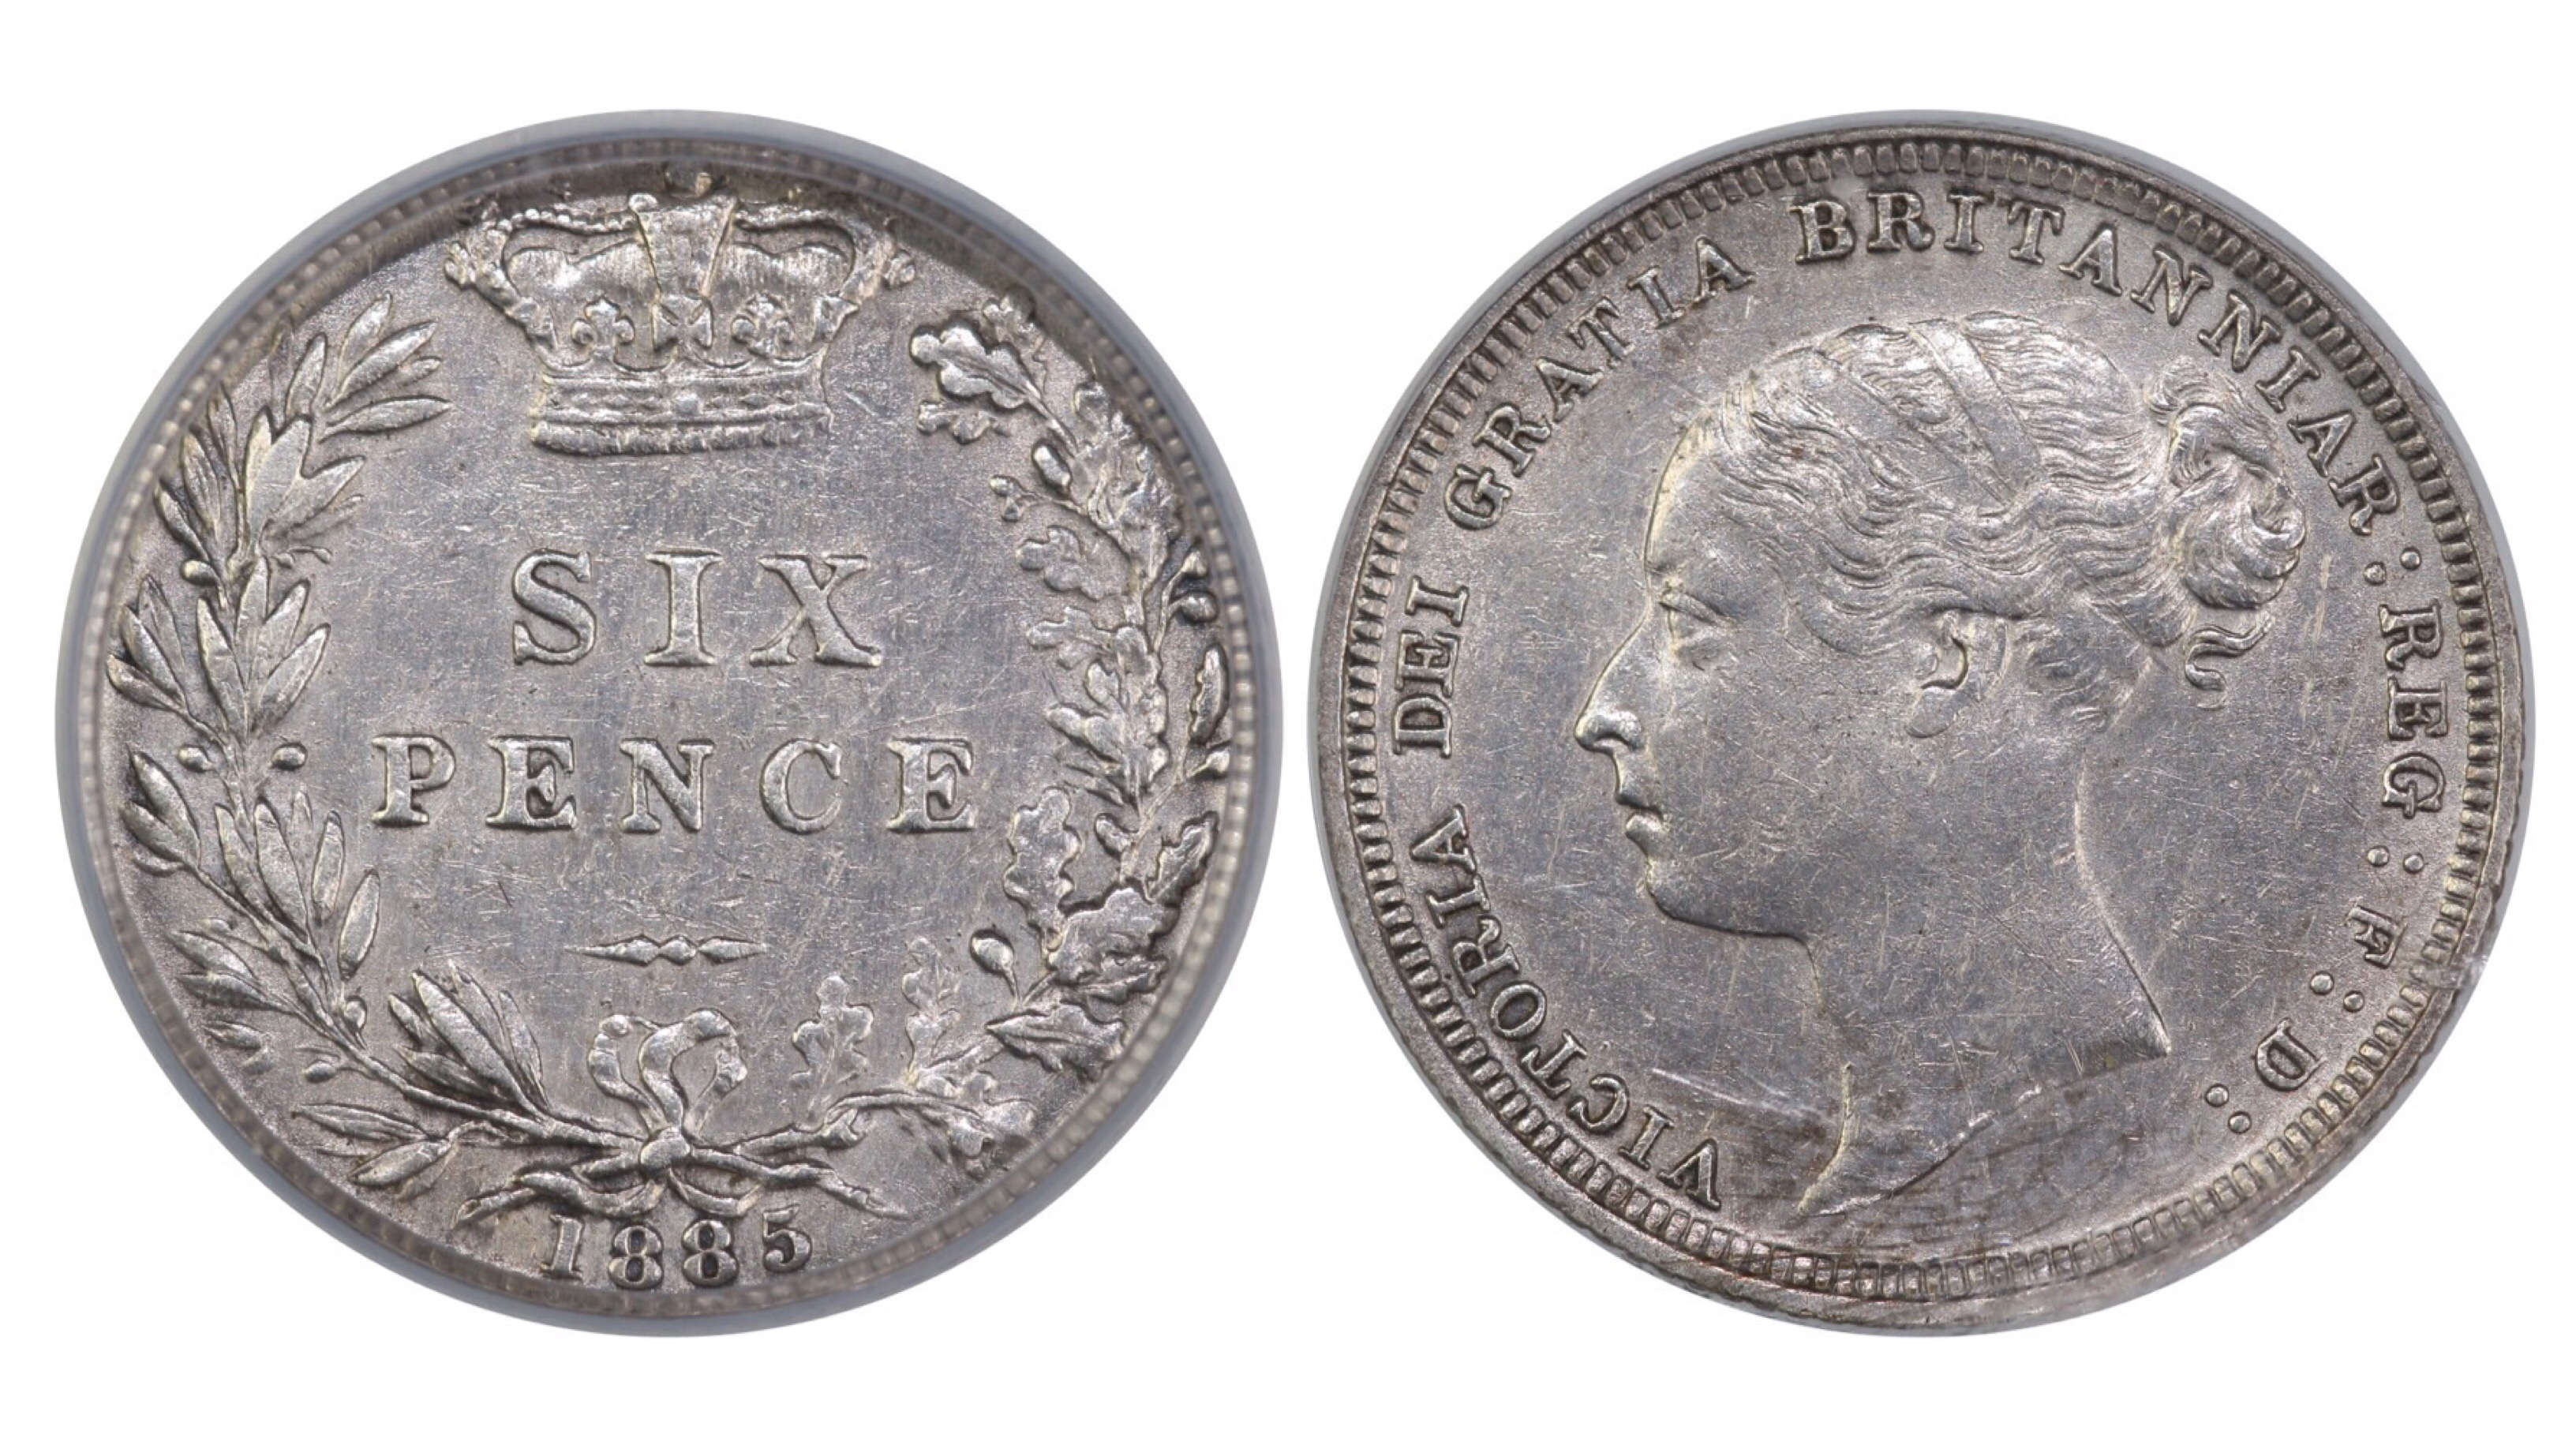 1885 Sixpence, CGS 60, Victoria, ESC 1746, UIN 22805